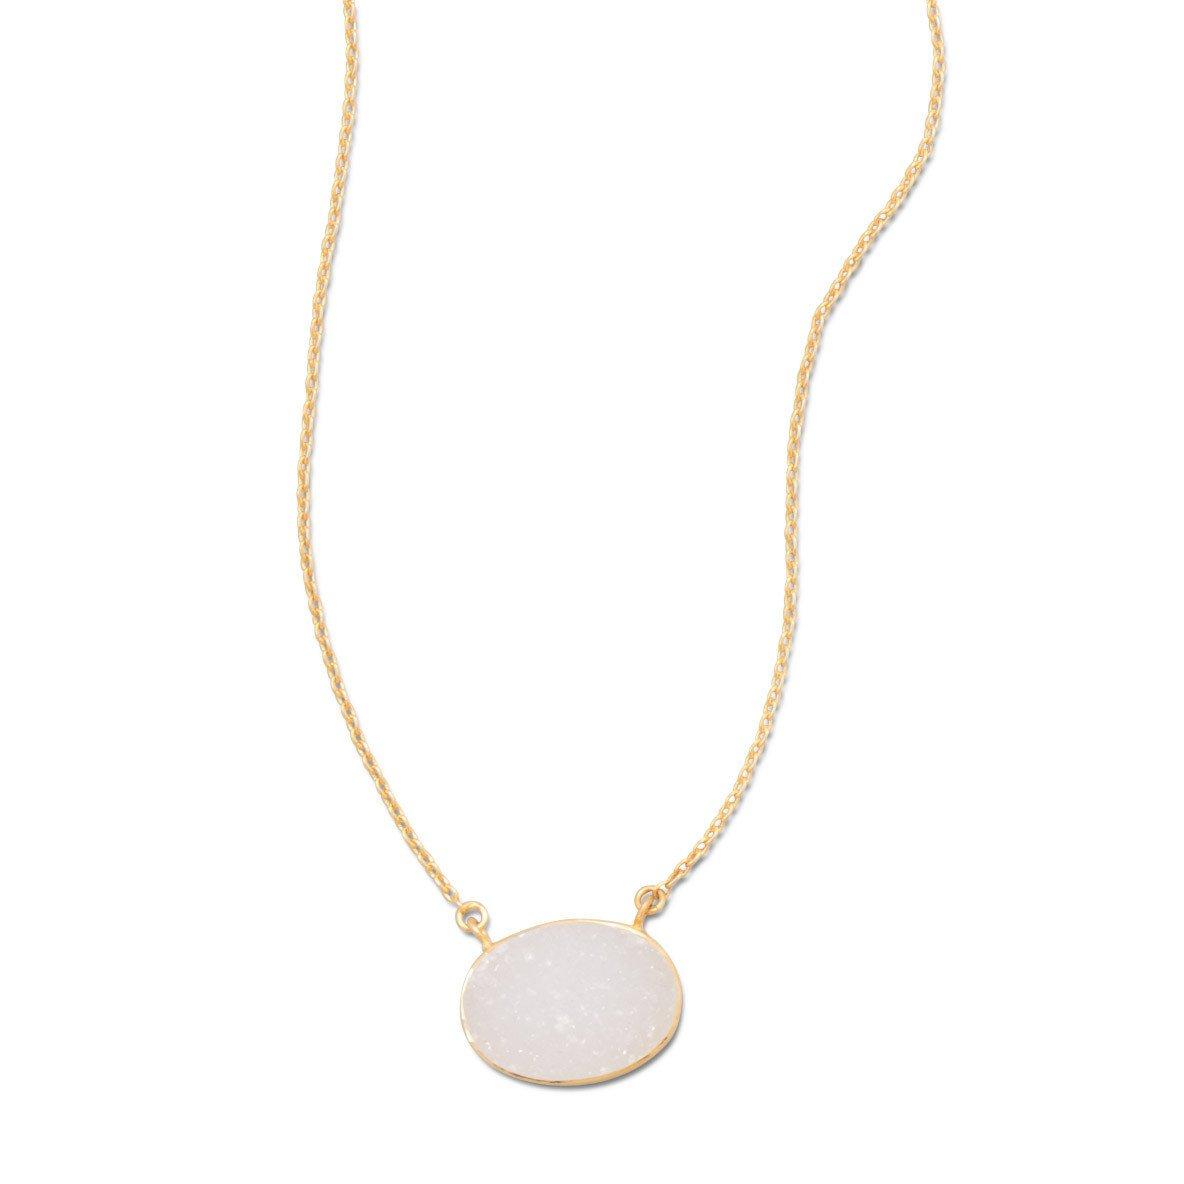 16″ + 2″ 14 Karat Gold Plated White Druzy Necklace